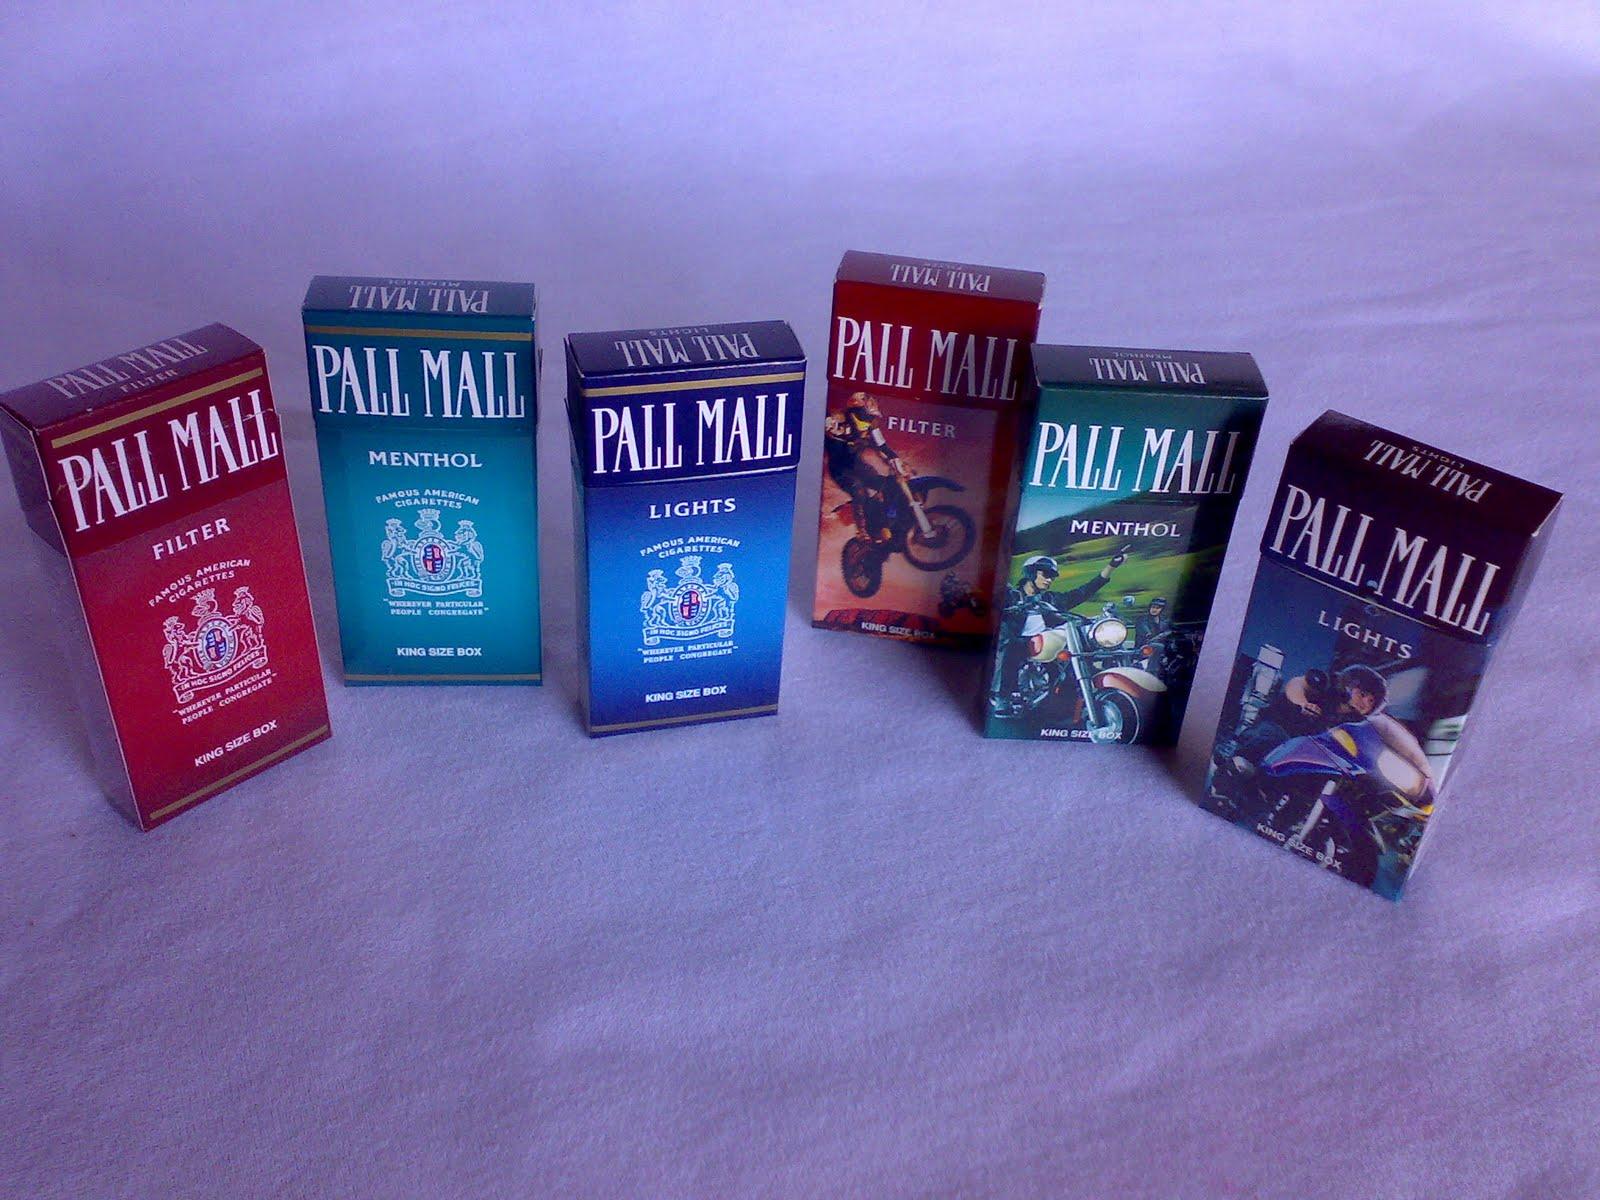 Pall Mall snus